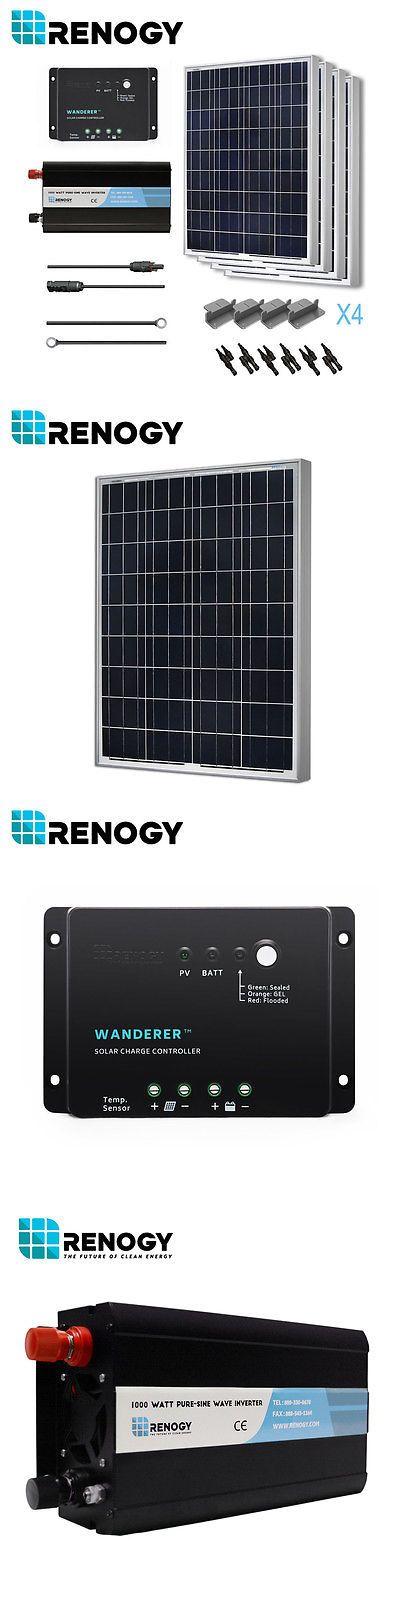 Solar Panels 41981: Renogy 400W Poly Solar Panel Battery Ready Kit Off Grid Inverter 12 Volt Rv Boat -> BUY IT NOW ONLY: $811.43 on eBay!